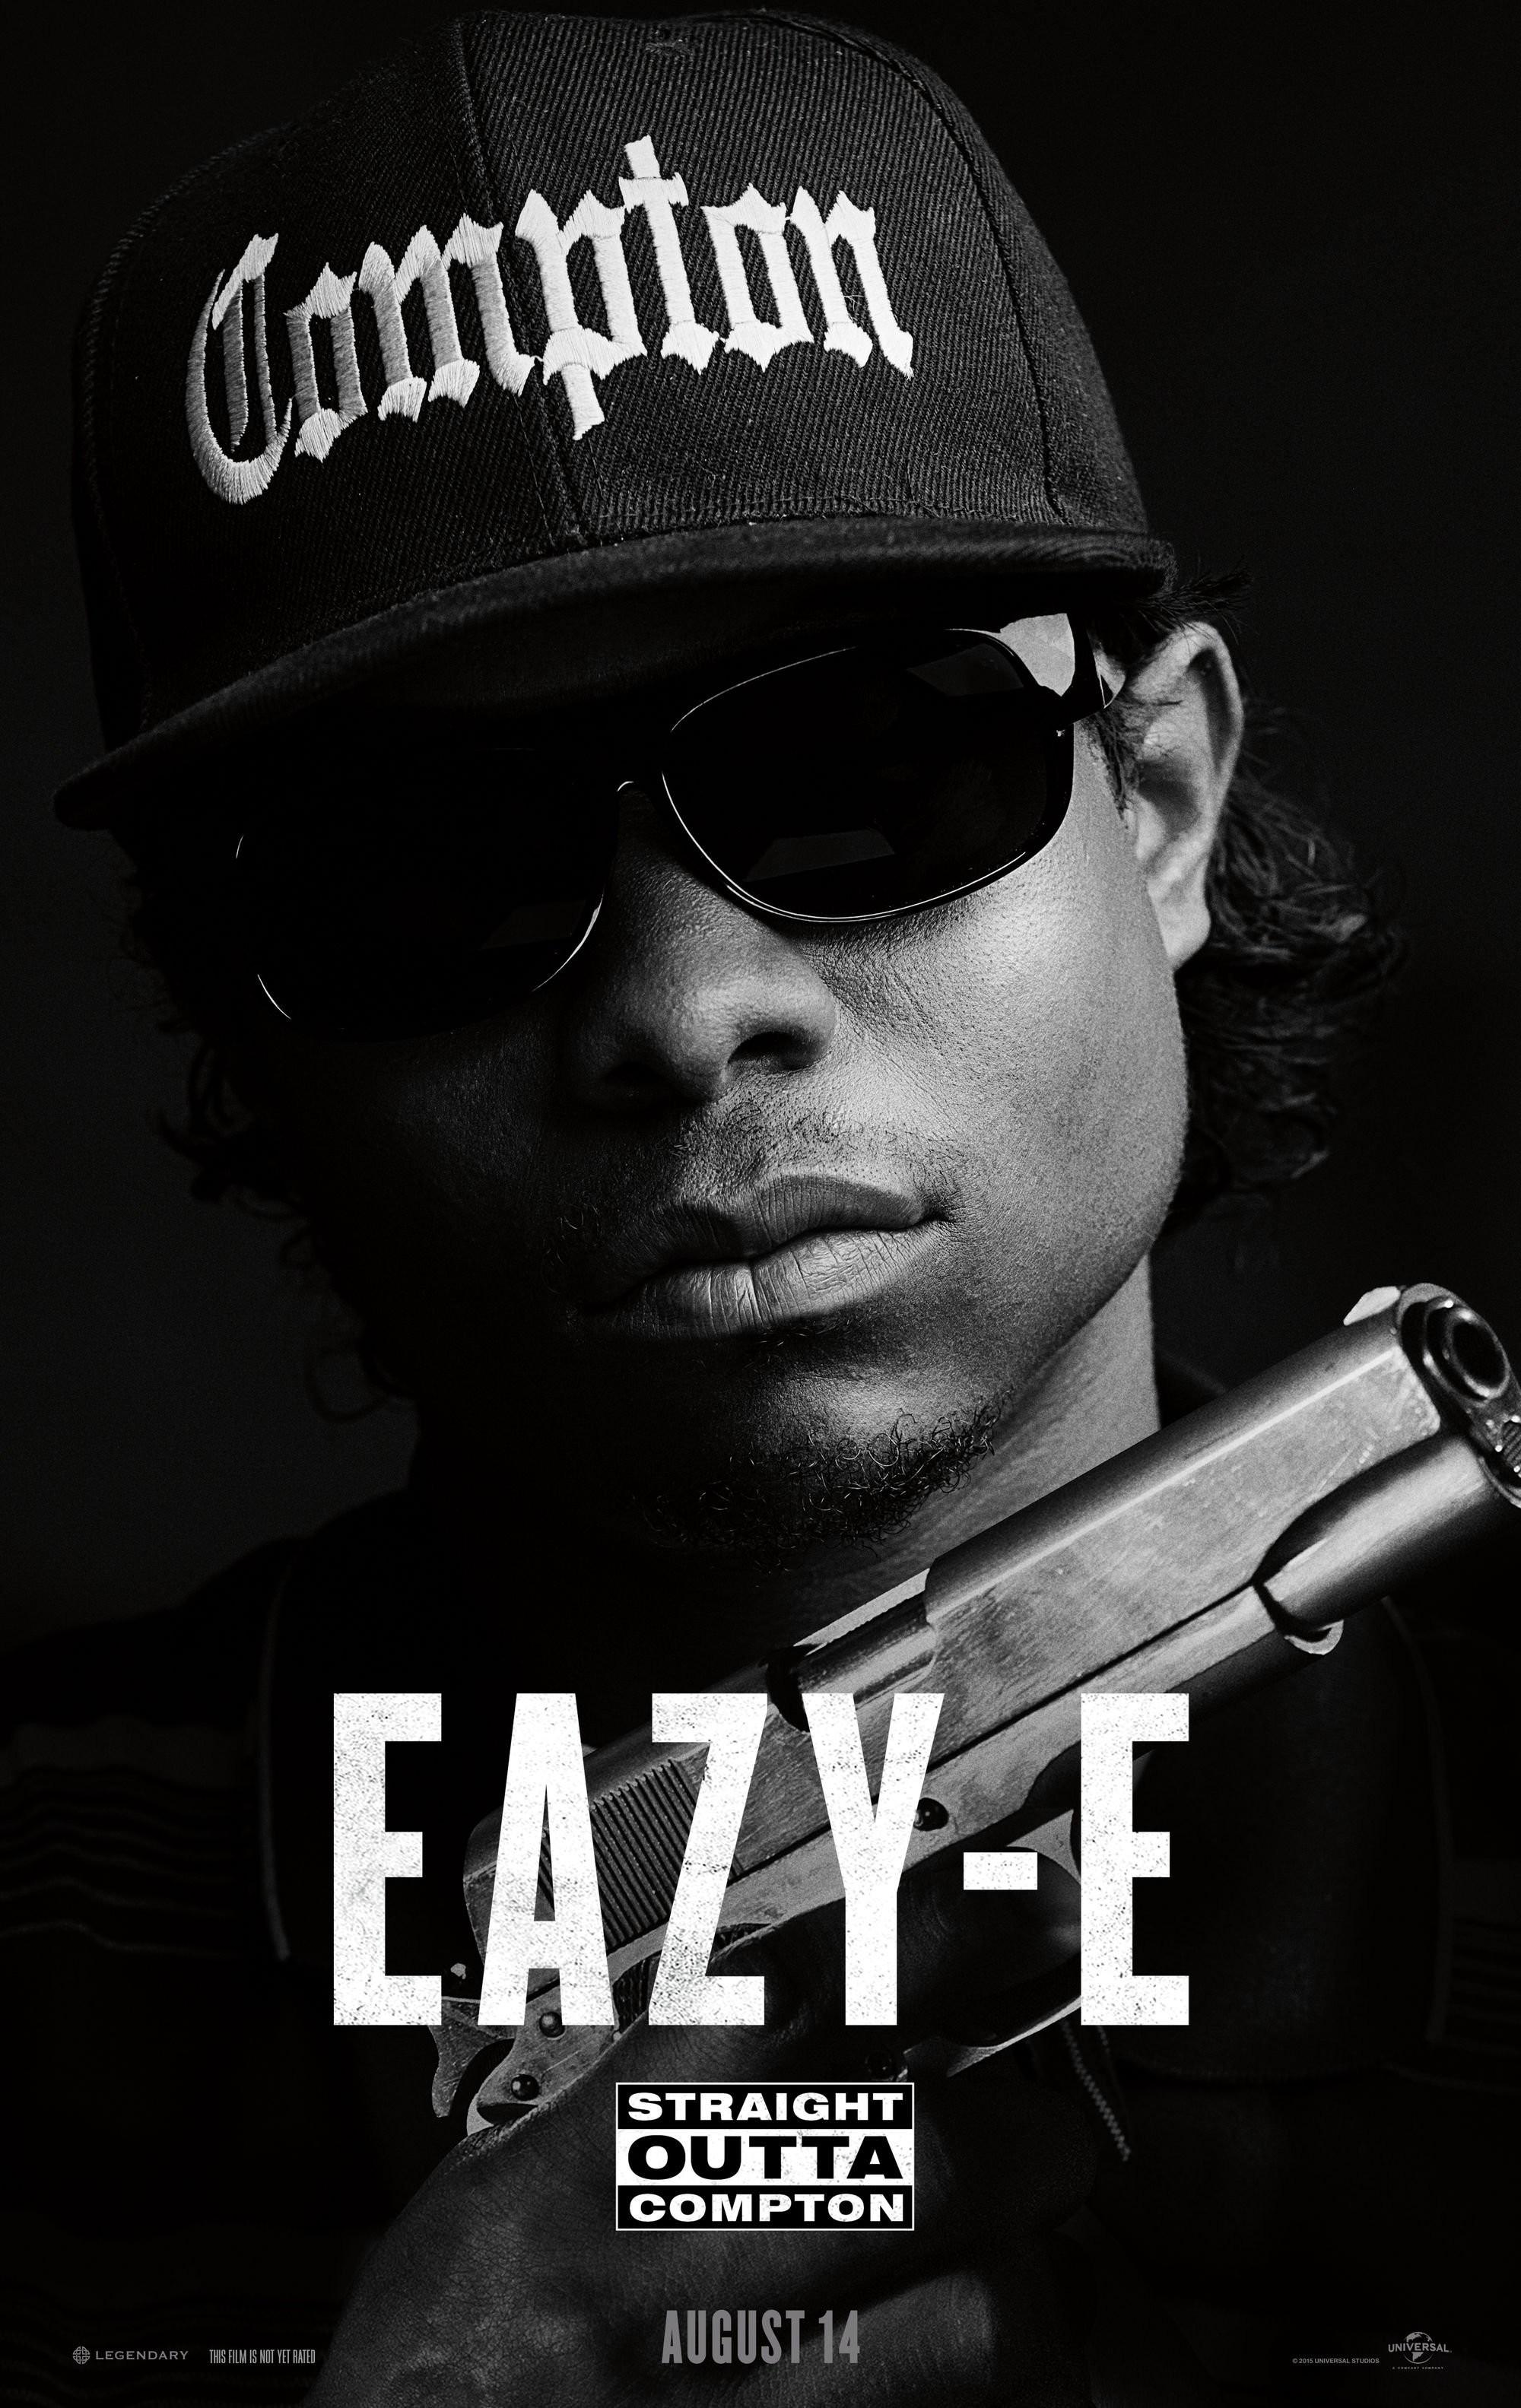 STRAIGHT OUTTA COMPTON rap rapper hip hop gangsta nwa biography drama music  1soc poster wallpaper | | 789276 | WallpaperUP